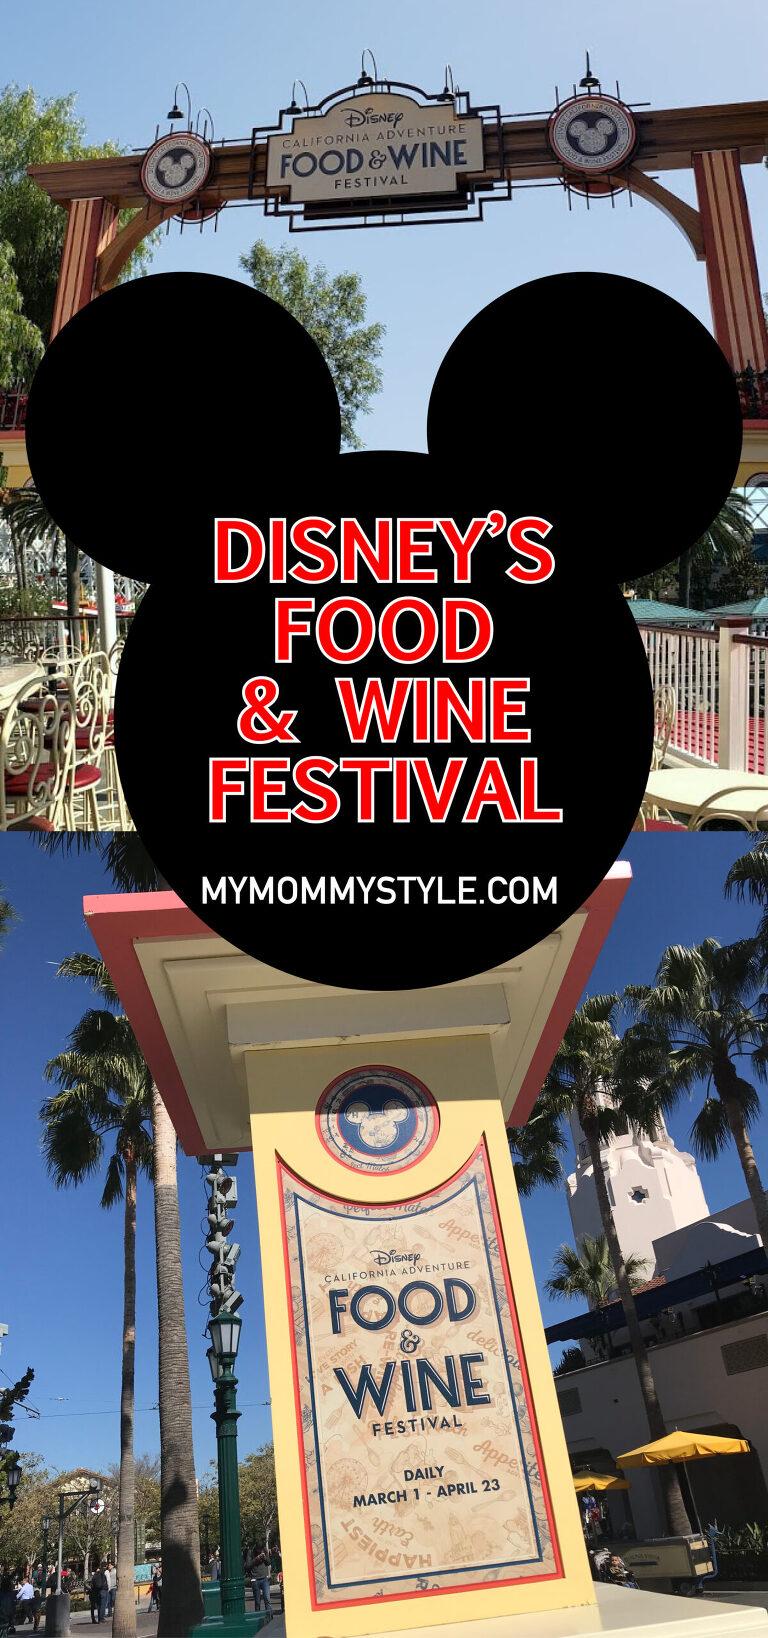 Disney Food And Wine Festival 2020 Dates.Disney Food And Wine Festival My Mommy Style